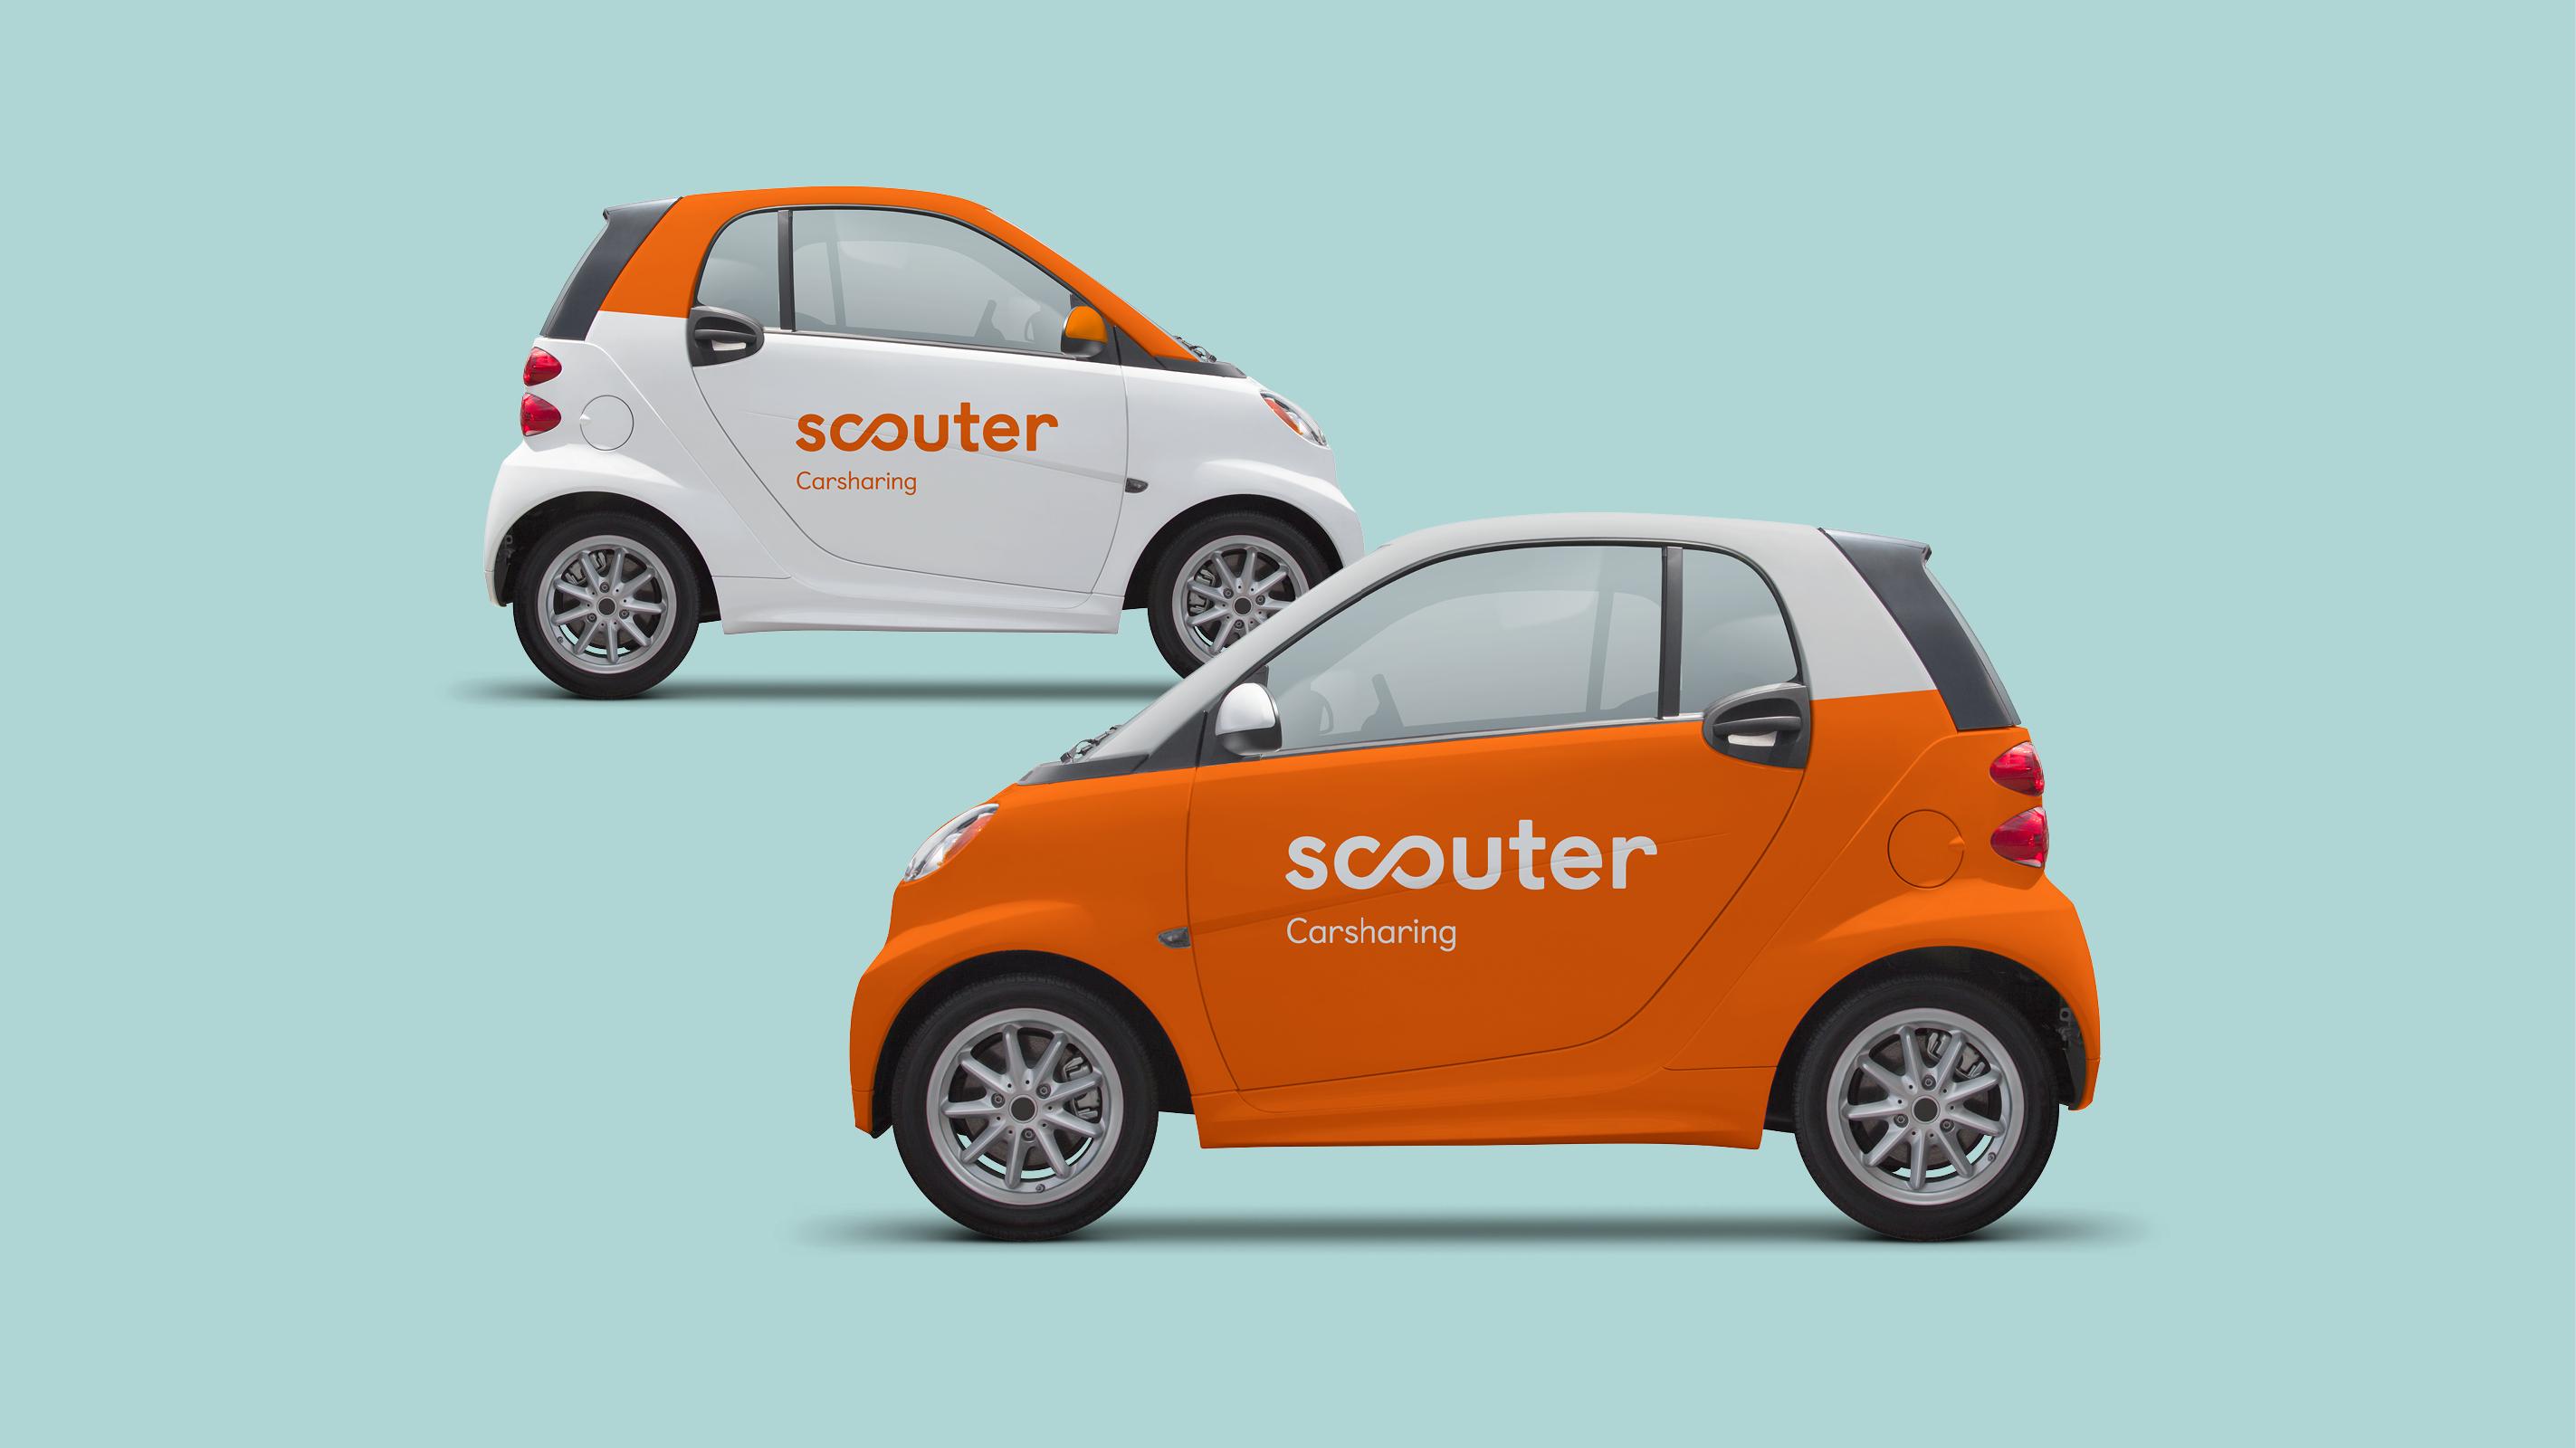 Scouter Carsharing – Poarangan Brand Design8